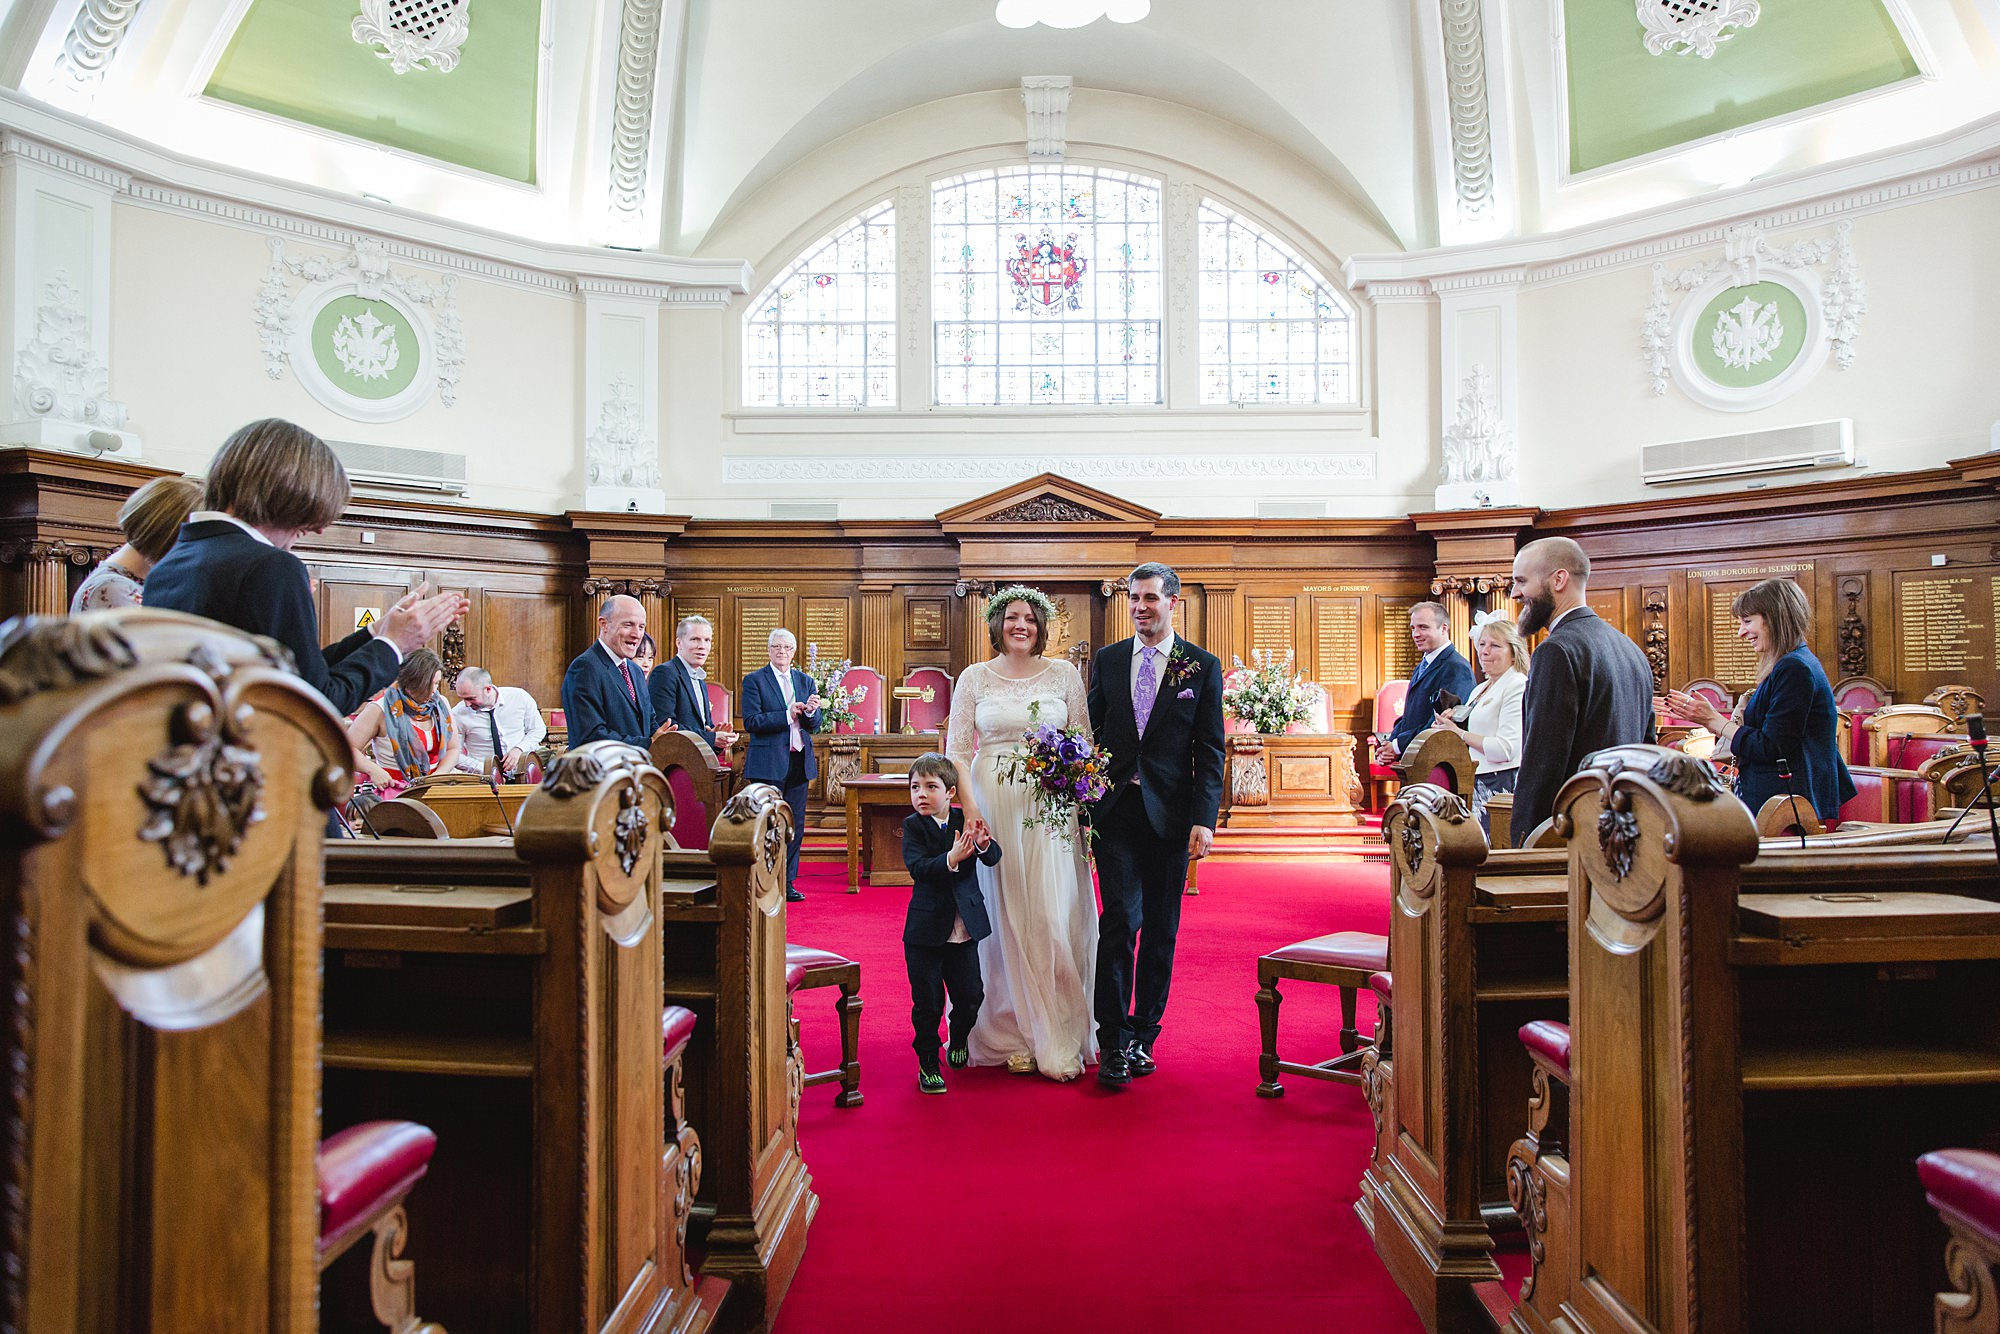 fun london wedding bowling bride and groom walk down aisle